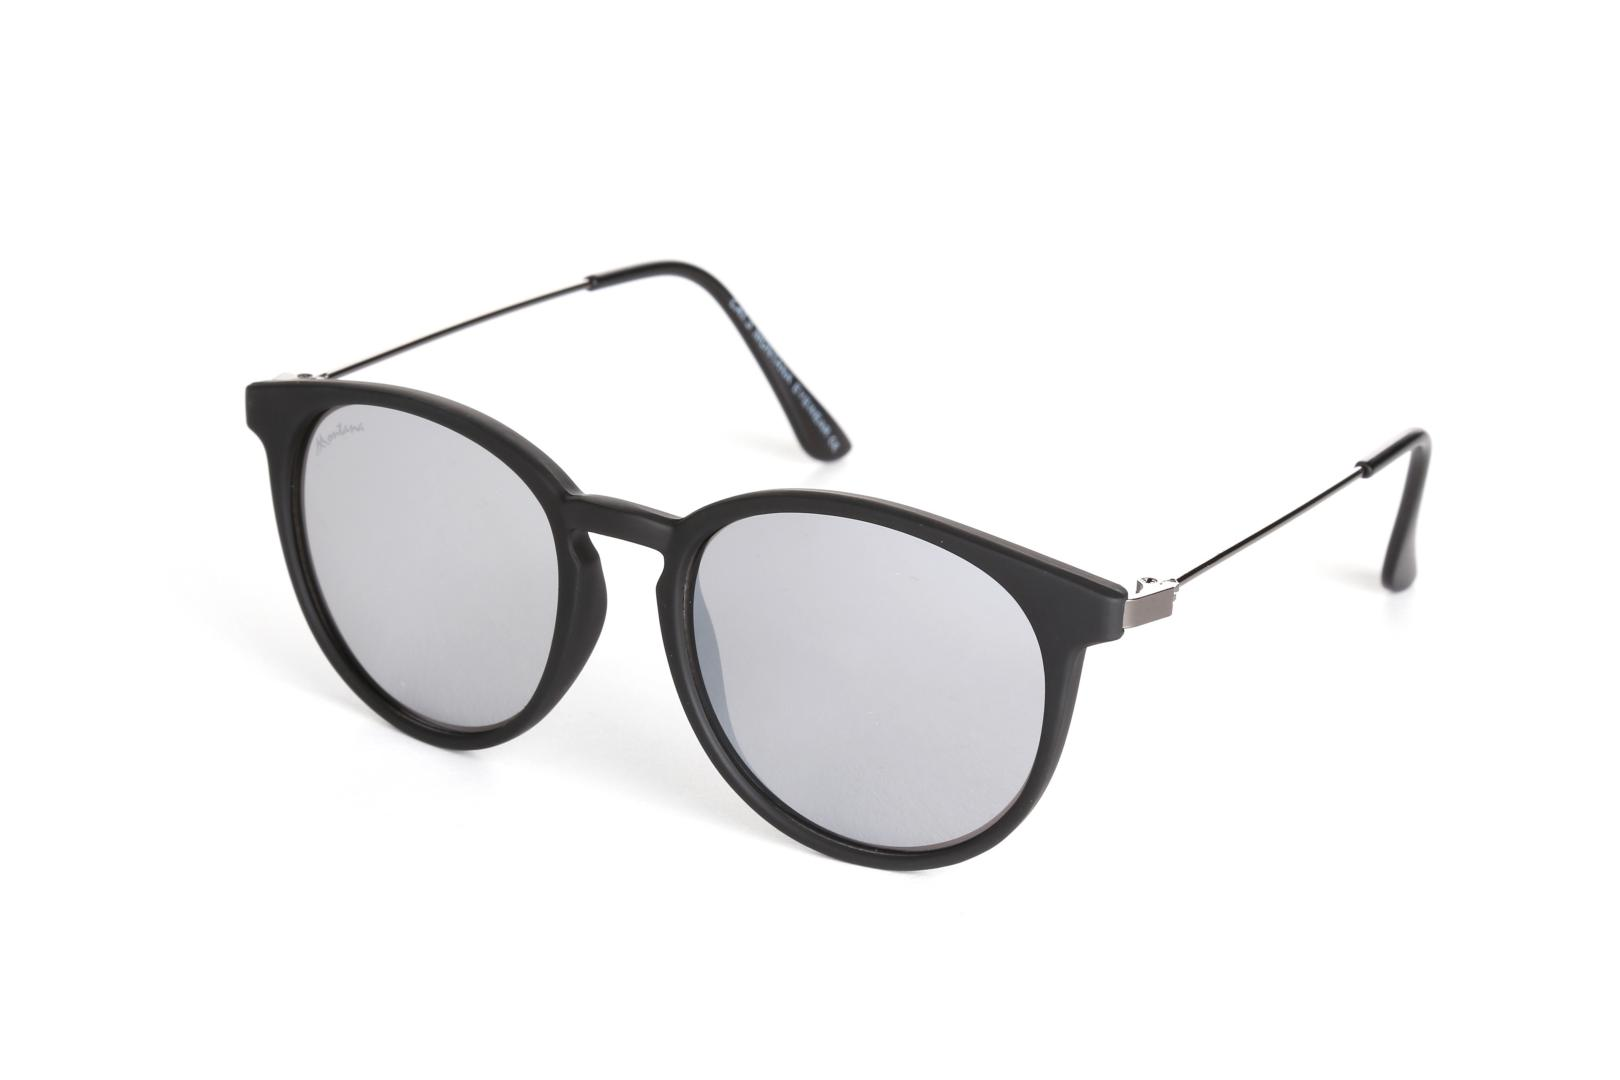 Montana Eyewear MS33-Rot QiLAC9Koyl